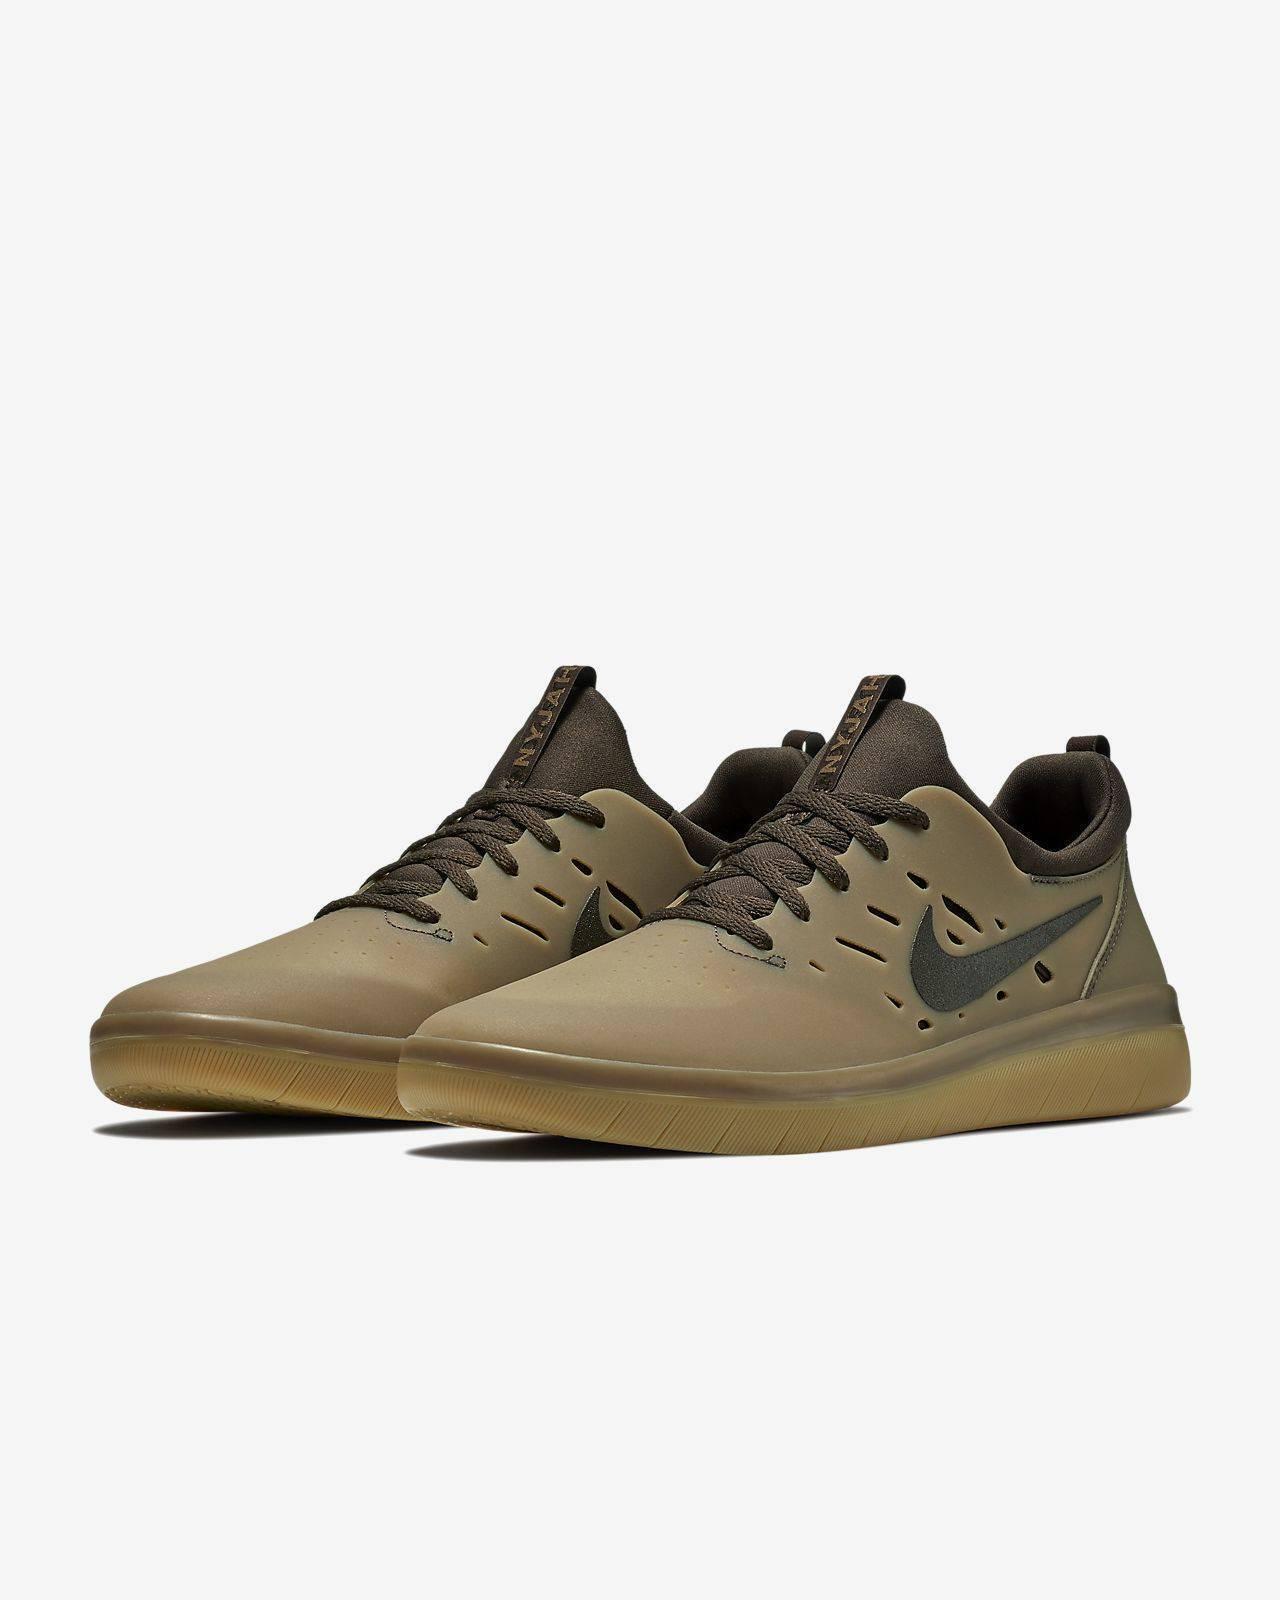 NIKE SB Nyjah Free Skateboard Shoes Gum Dark Brown AA4272-992 Size 9.5